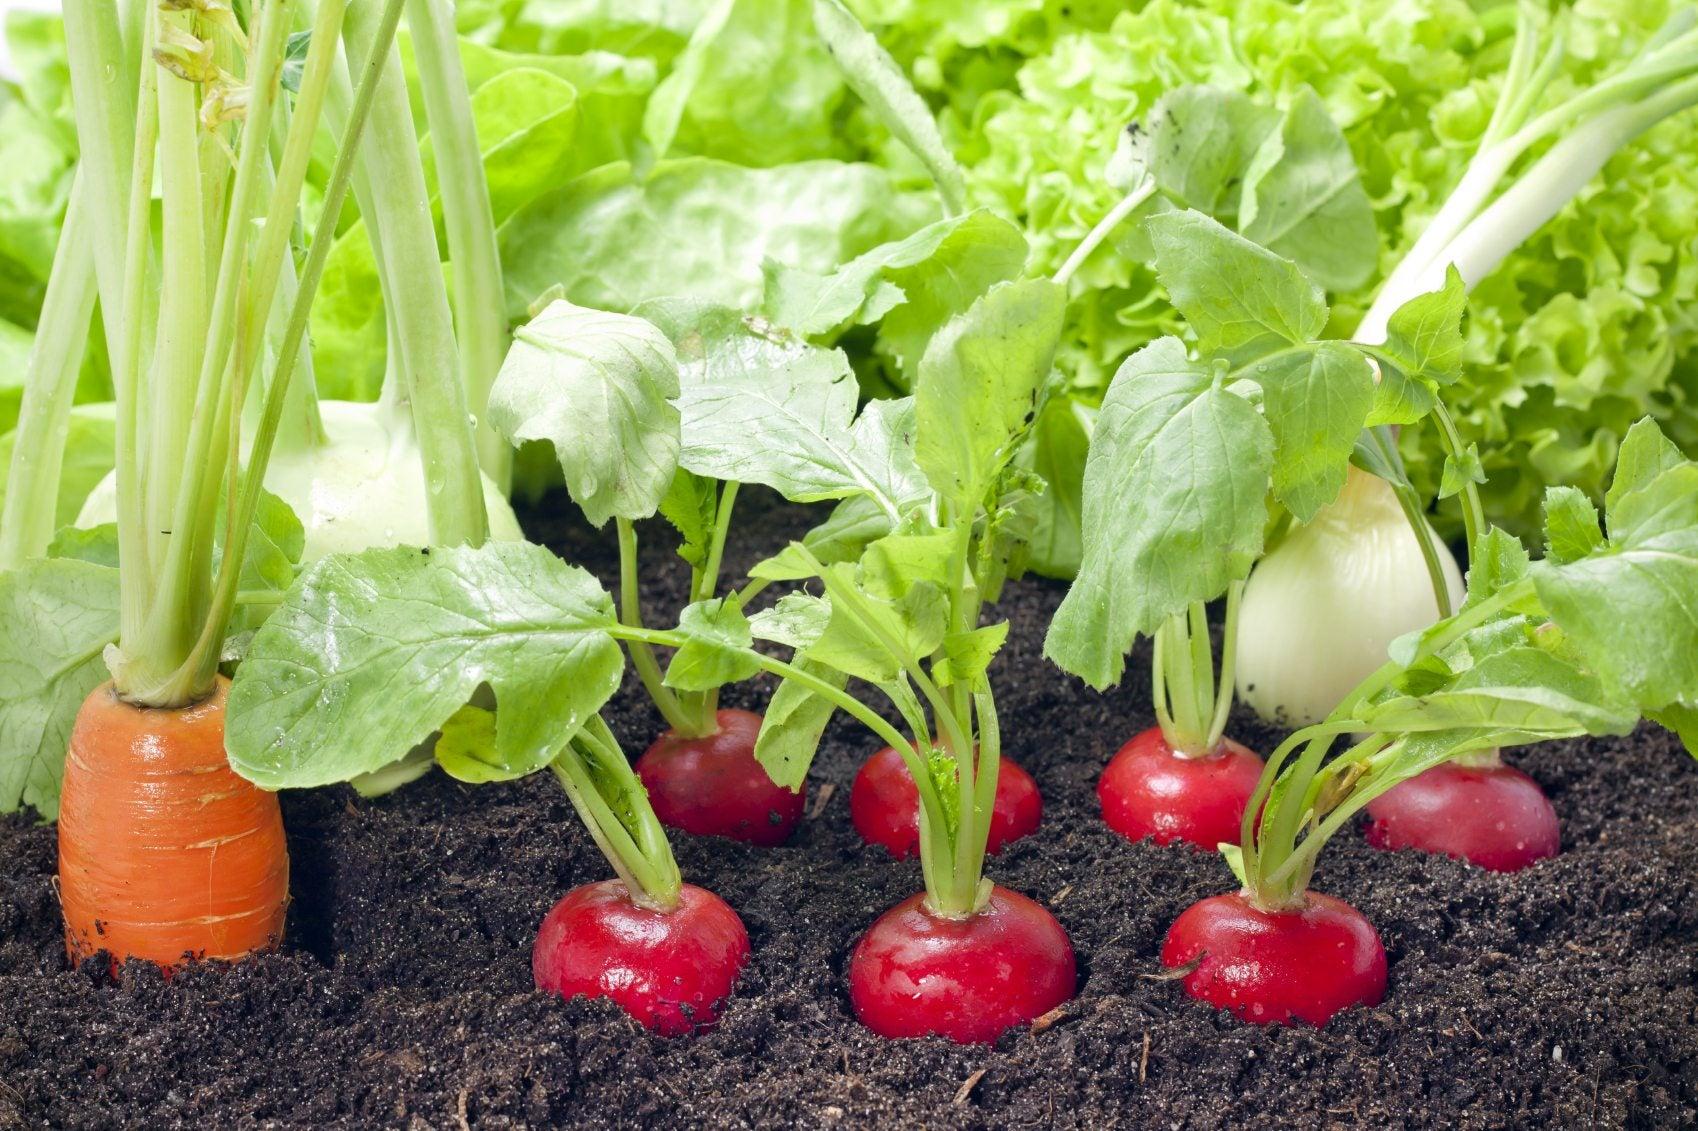 Radish is green, useful properties